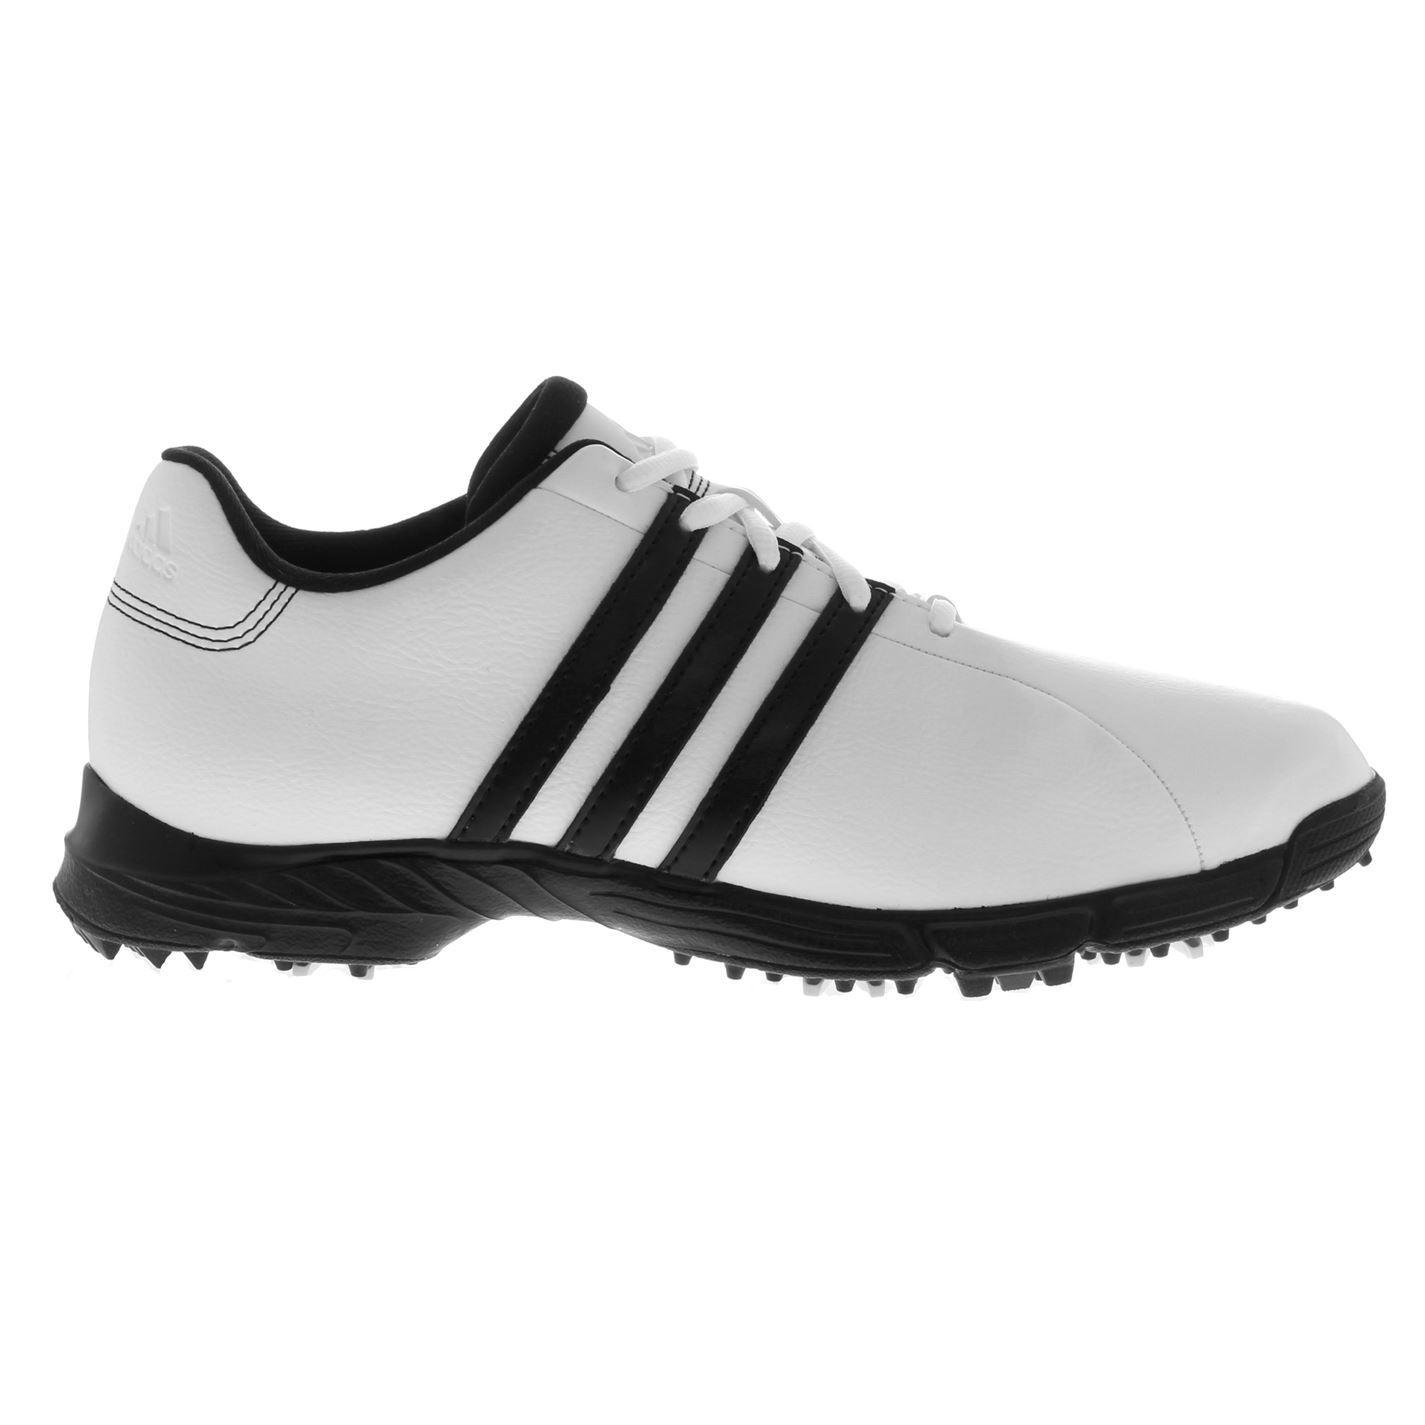 adidas-Golflite-Golf-Shoes-Mens-Spikes-Footwear thumbnail 14